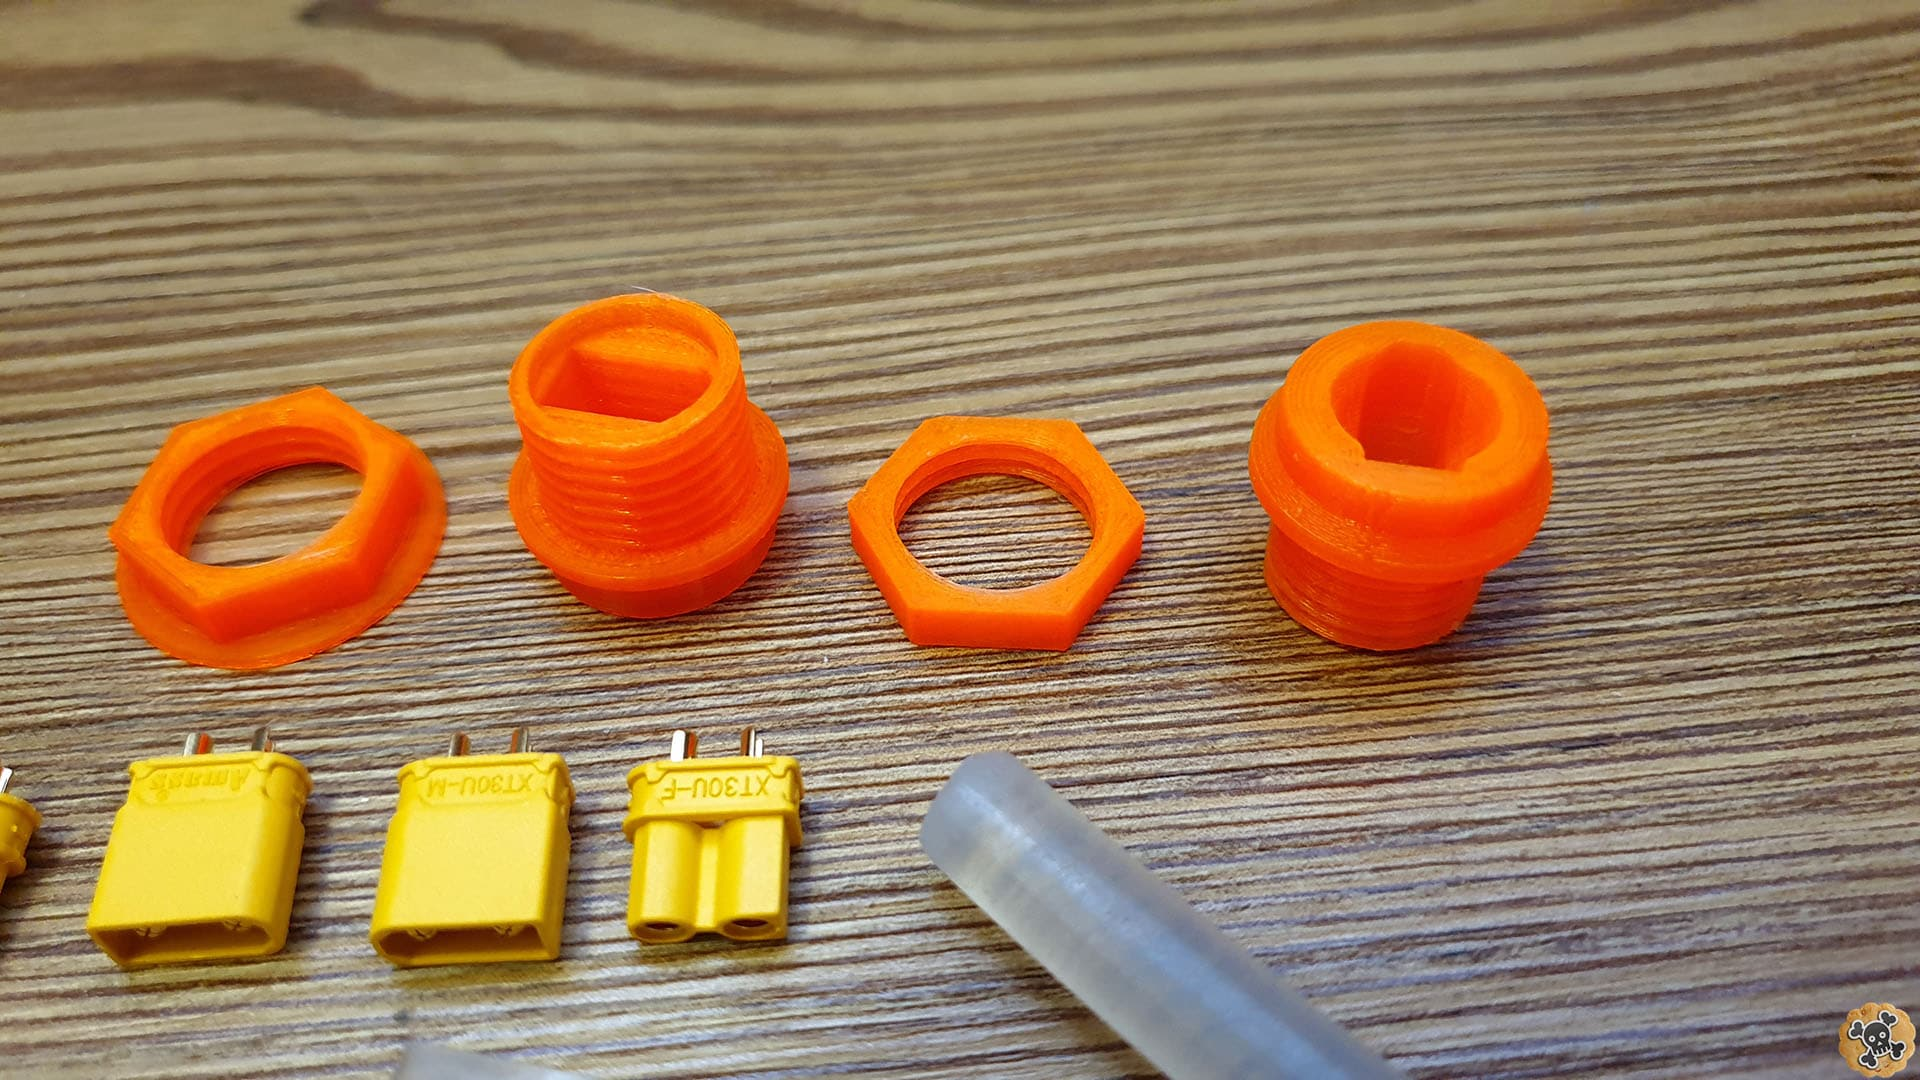 Better Chargin port for Escoot XT30 Mod instead of Dangerous Microphone port ! DIY Set - 3